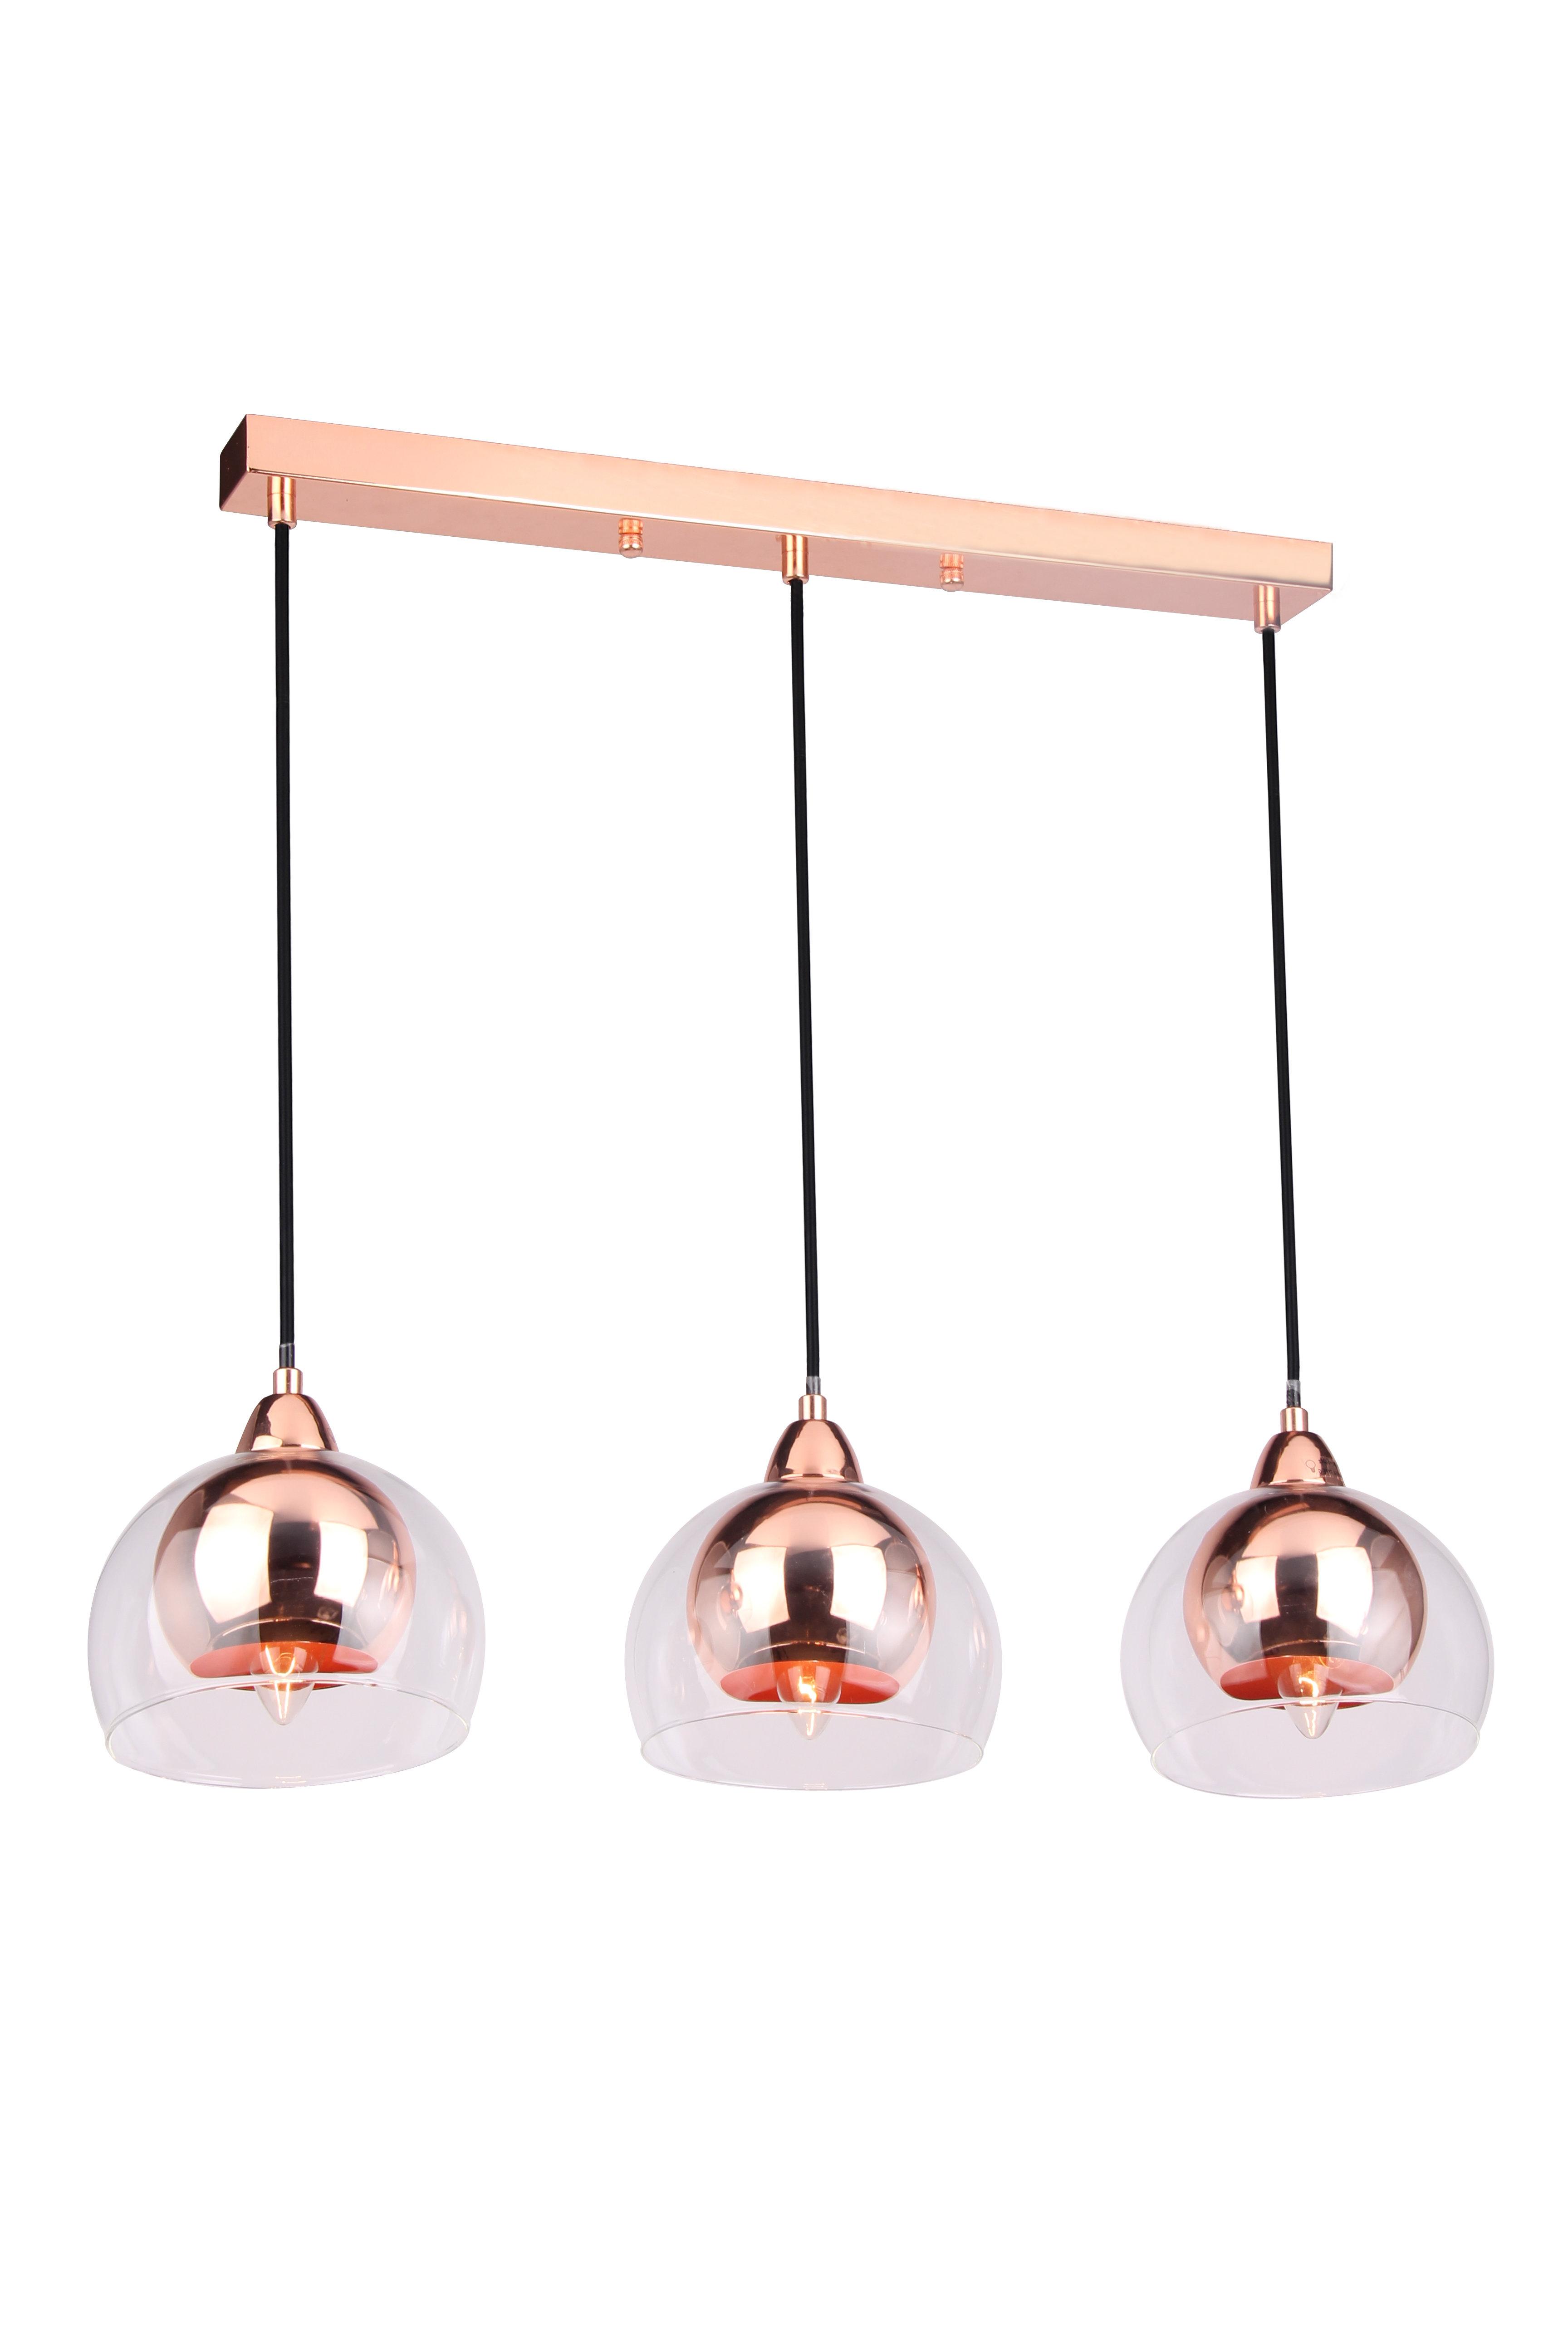 Latest Chauvin 3 Light Lantern Geometric Pendants Inside Chauvin 3 Light Kitchen Island Pendant (View 17 of 20)